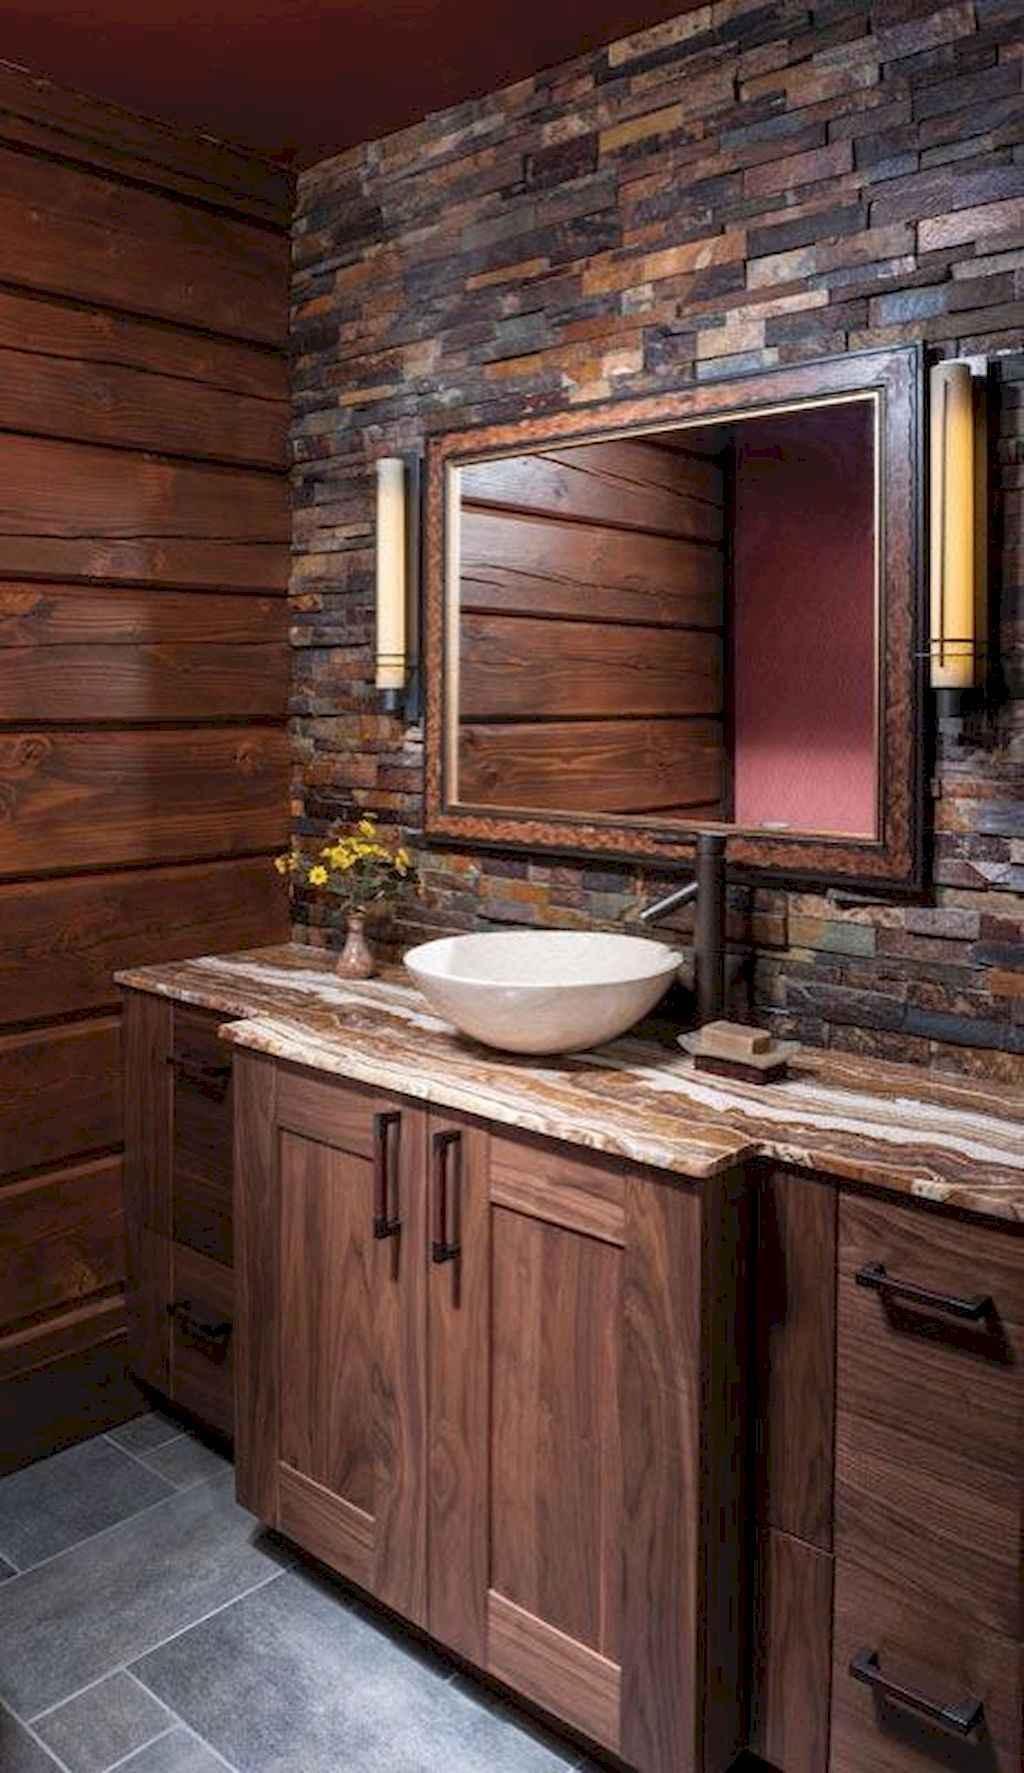 111 Brilliant Small Bathroom Remodel Ideas On A Budget (52)